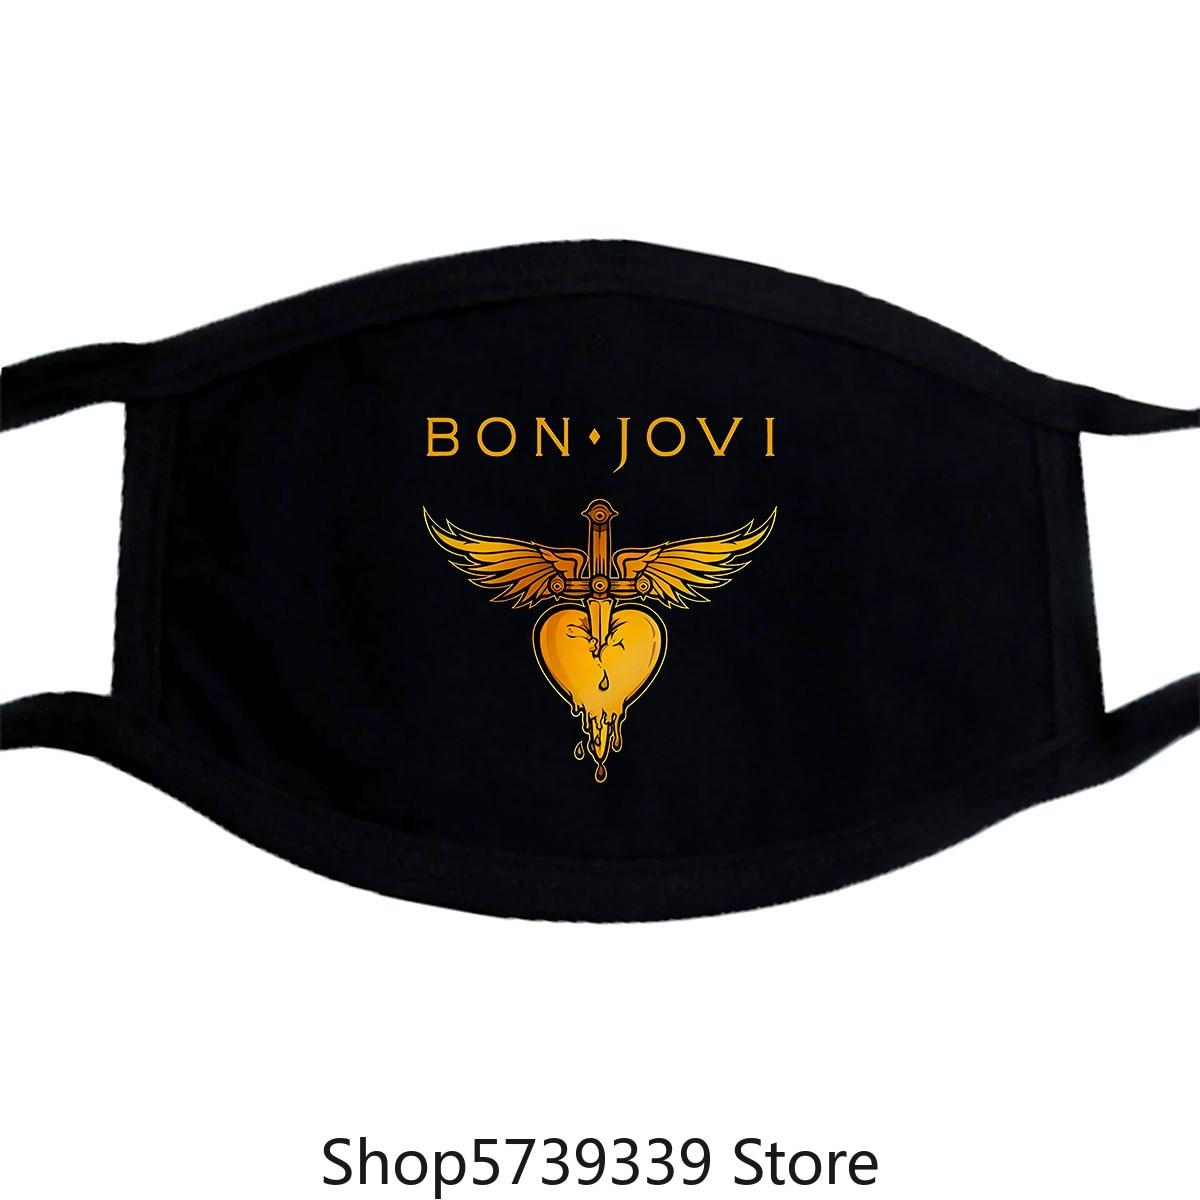 Bon Jovi Heart Graphic Mask, Cotton Rock Tee, Mens Washable Reusable Mask